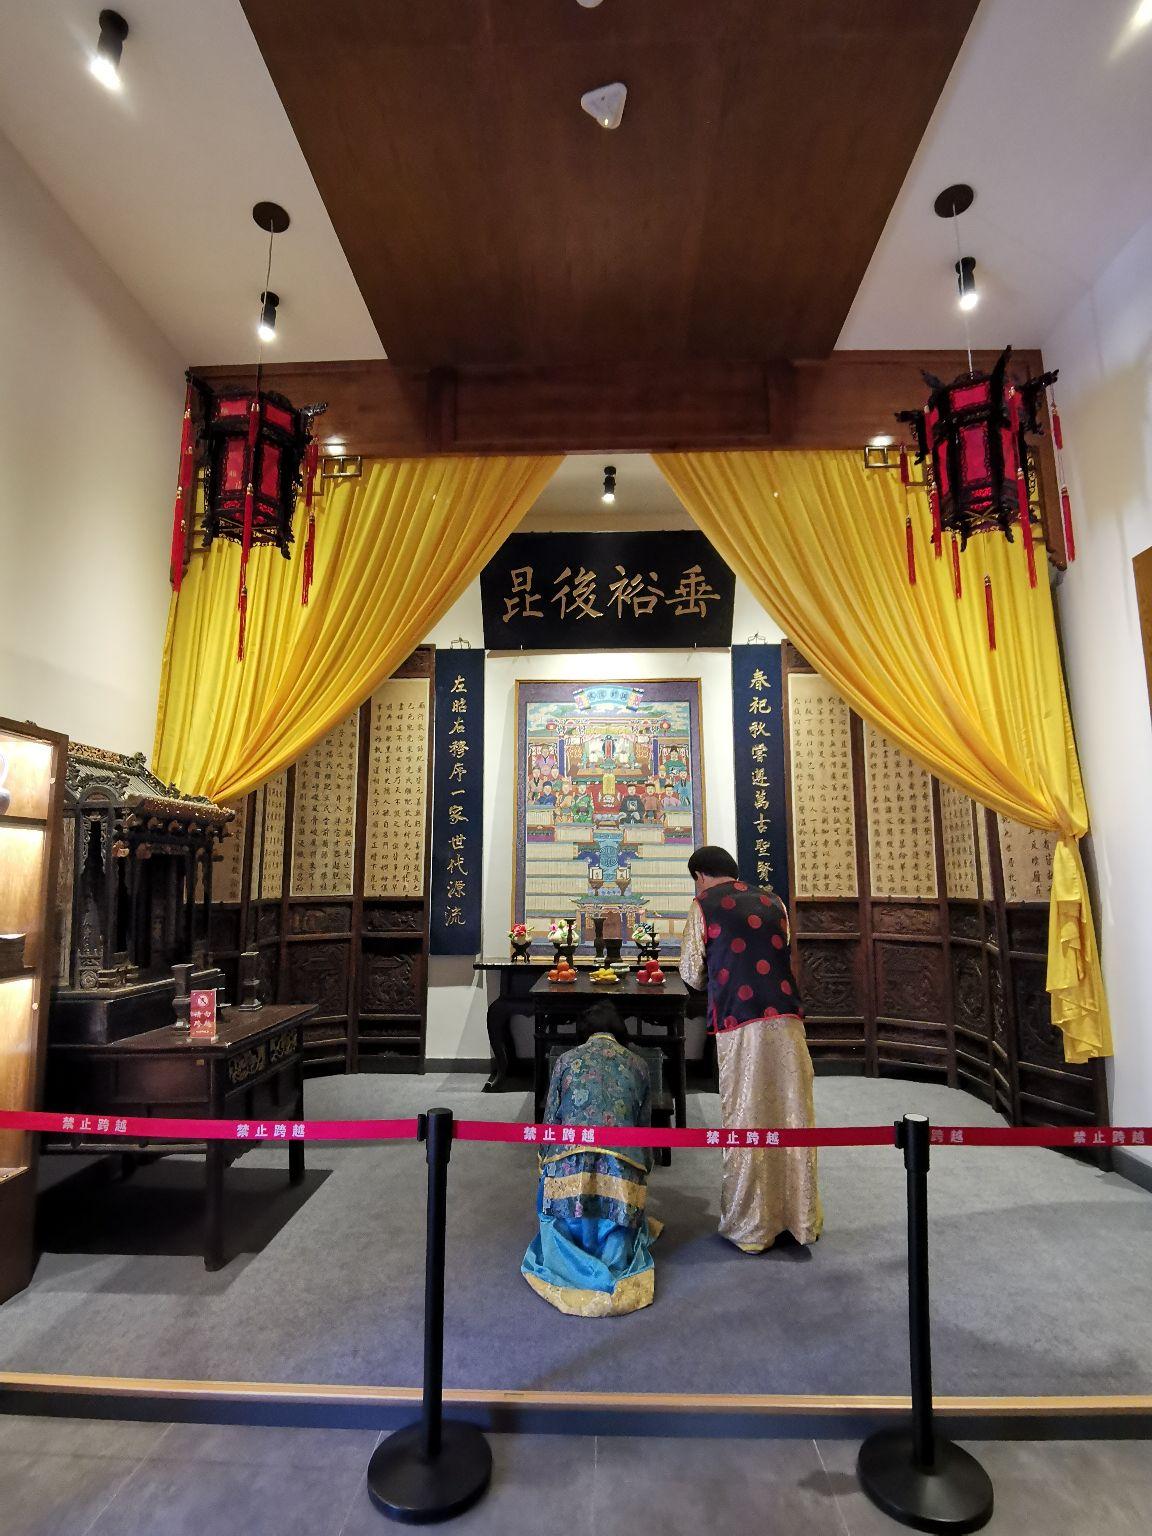 Luochuan Minsu Museum